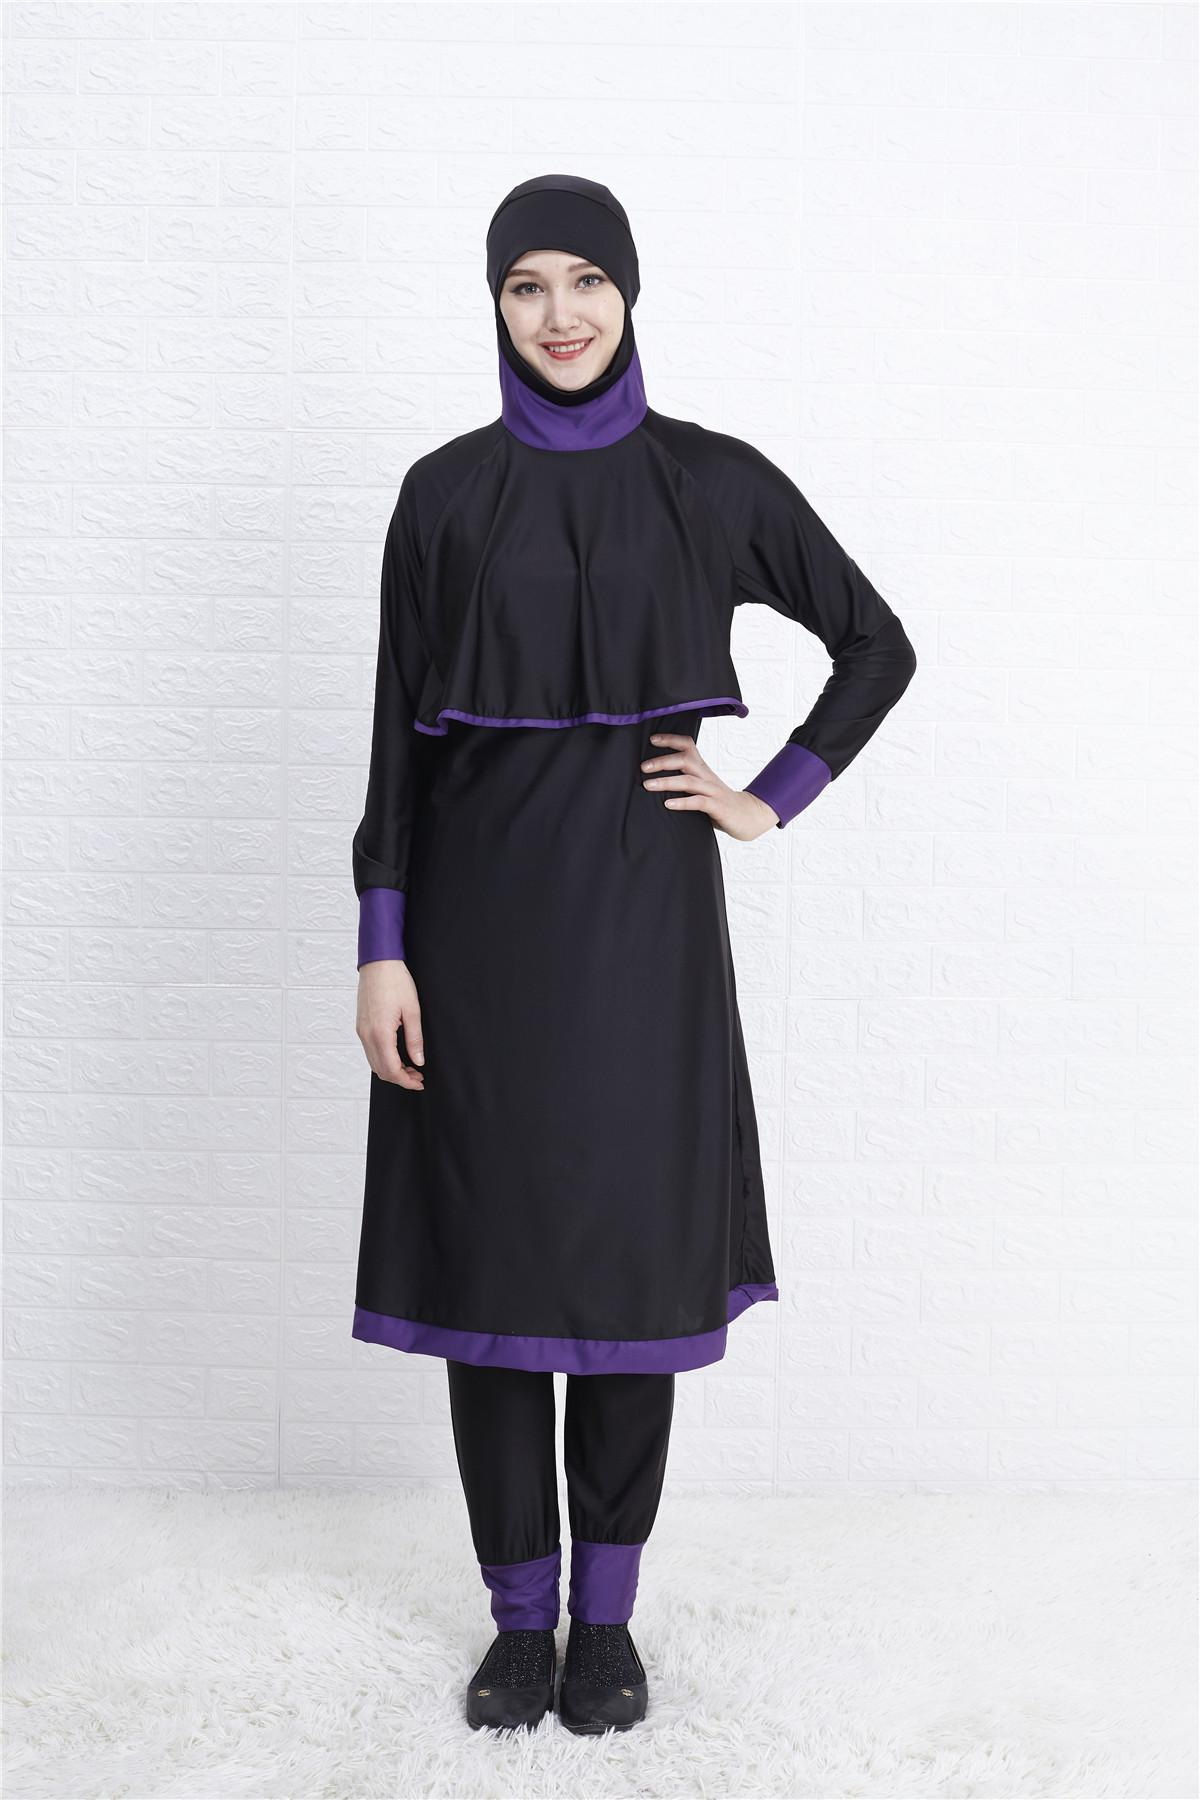 New Hijab Women Swimming Suit Long Full Cover Burkini Muslim Swimwear Swimsuit Woman Islamic Swim Wear Modest Bathing Beachwear